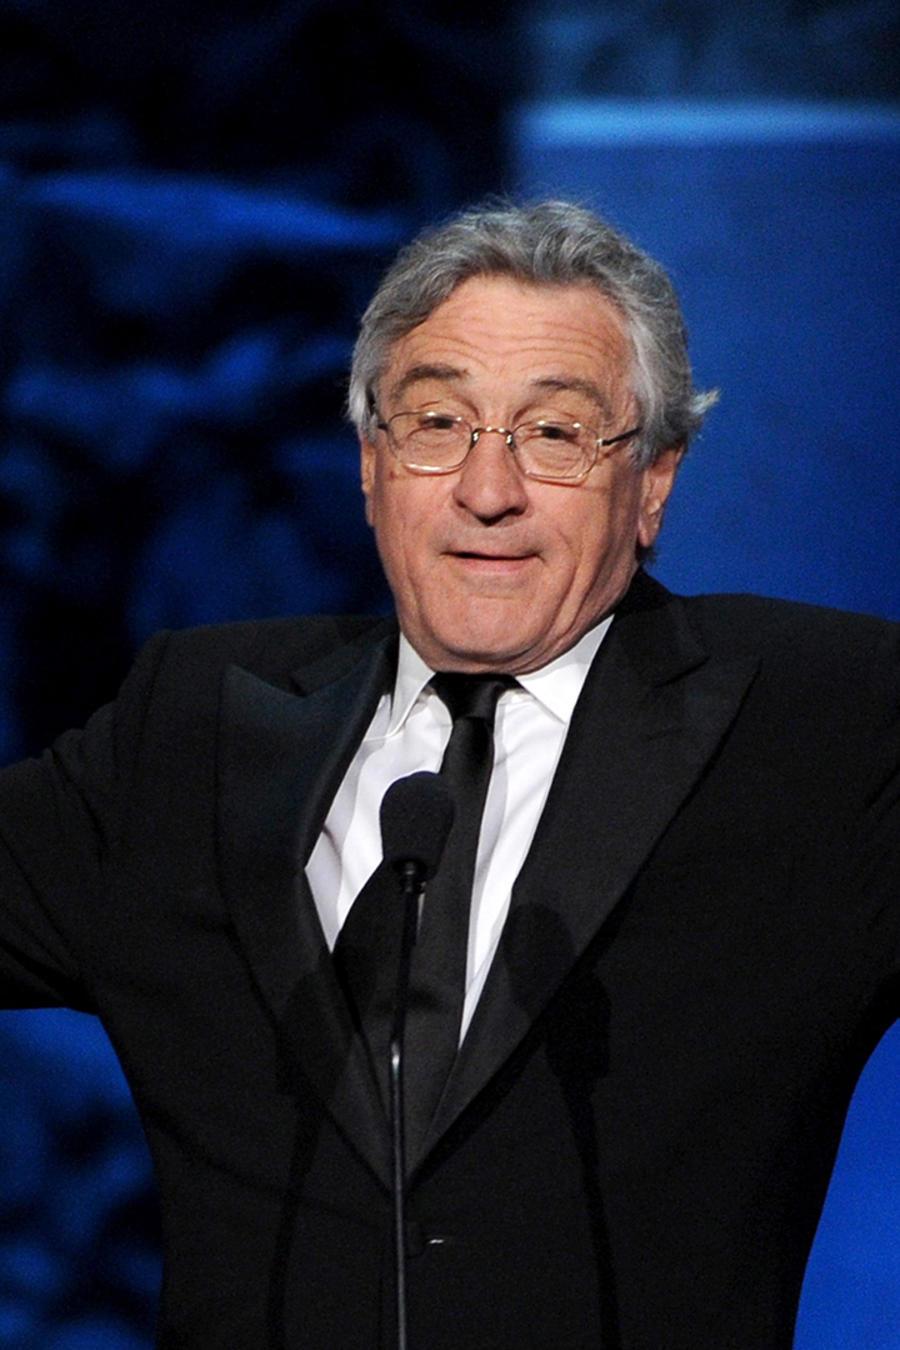 Robert De Niro to Receive the Screen Actors Guild's Life Achievement Award